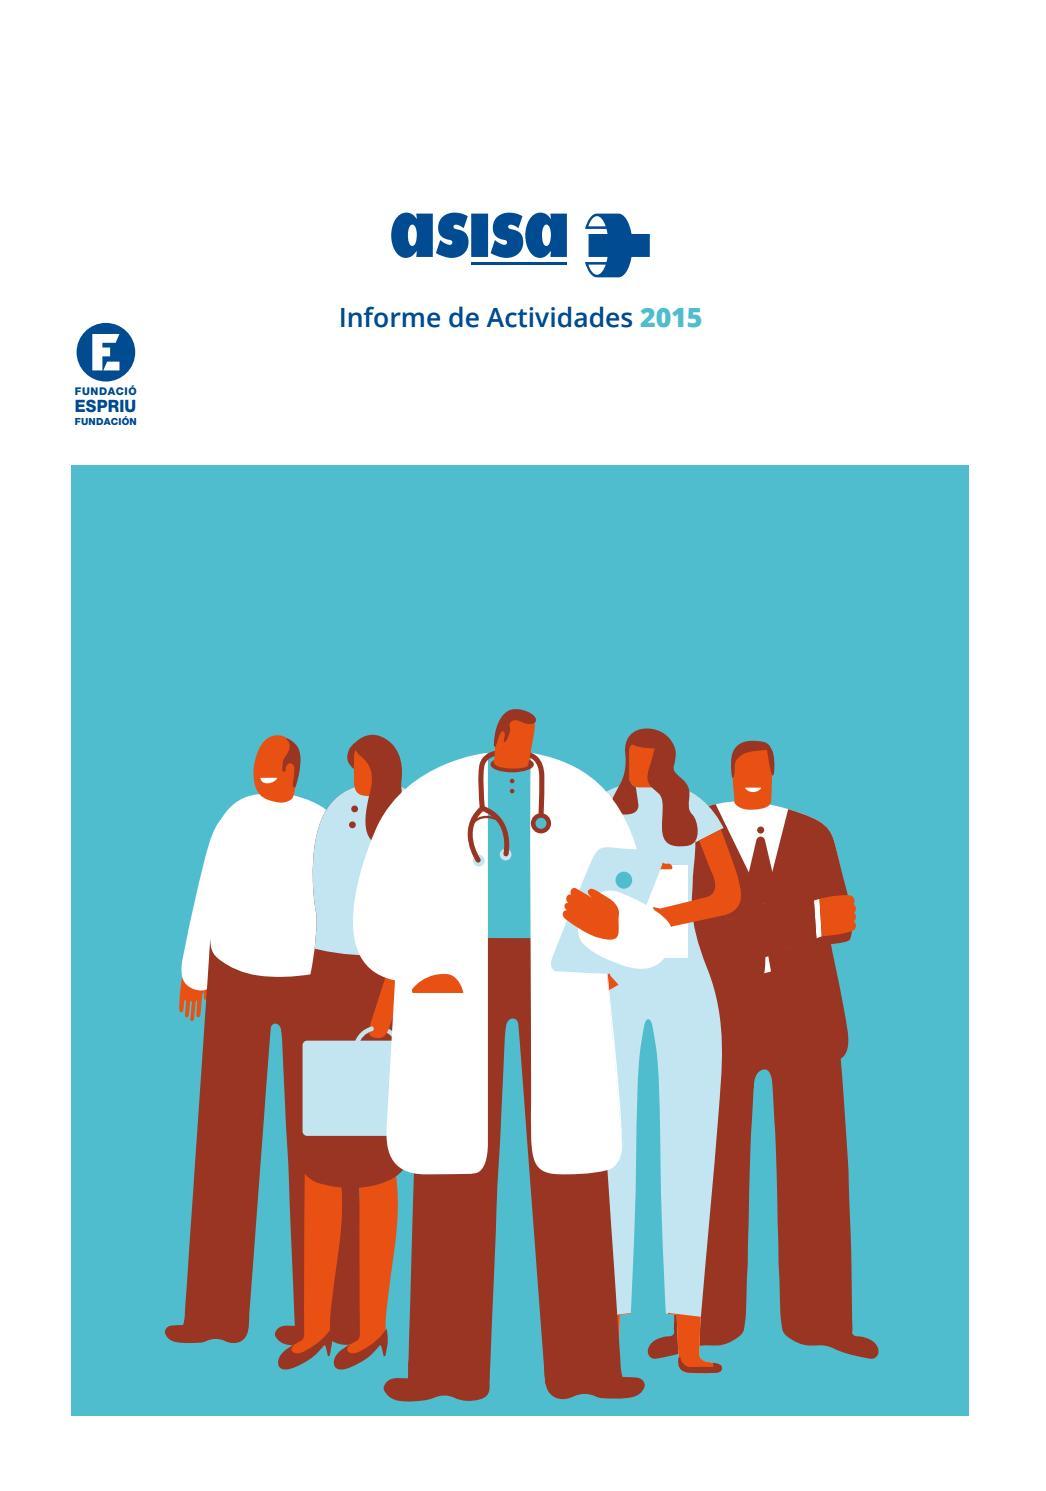 Informe actividad asisa 2015 by GRUPO ASISA - issuu